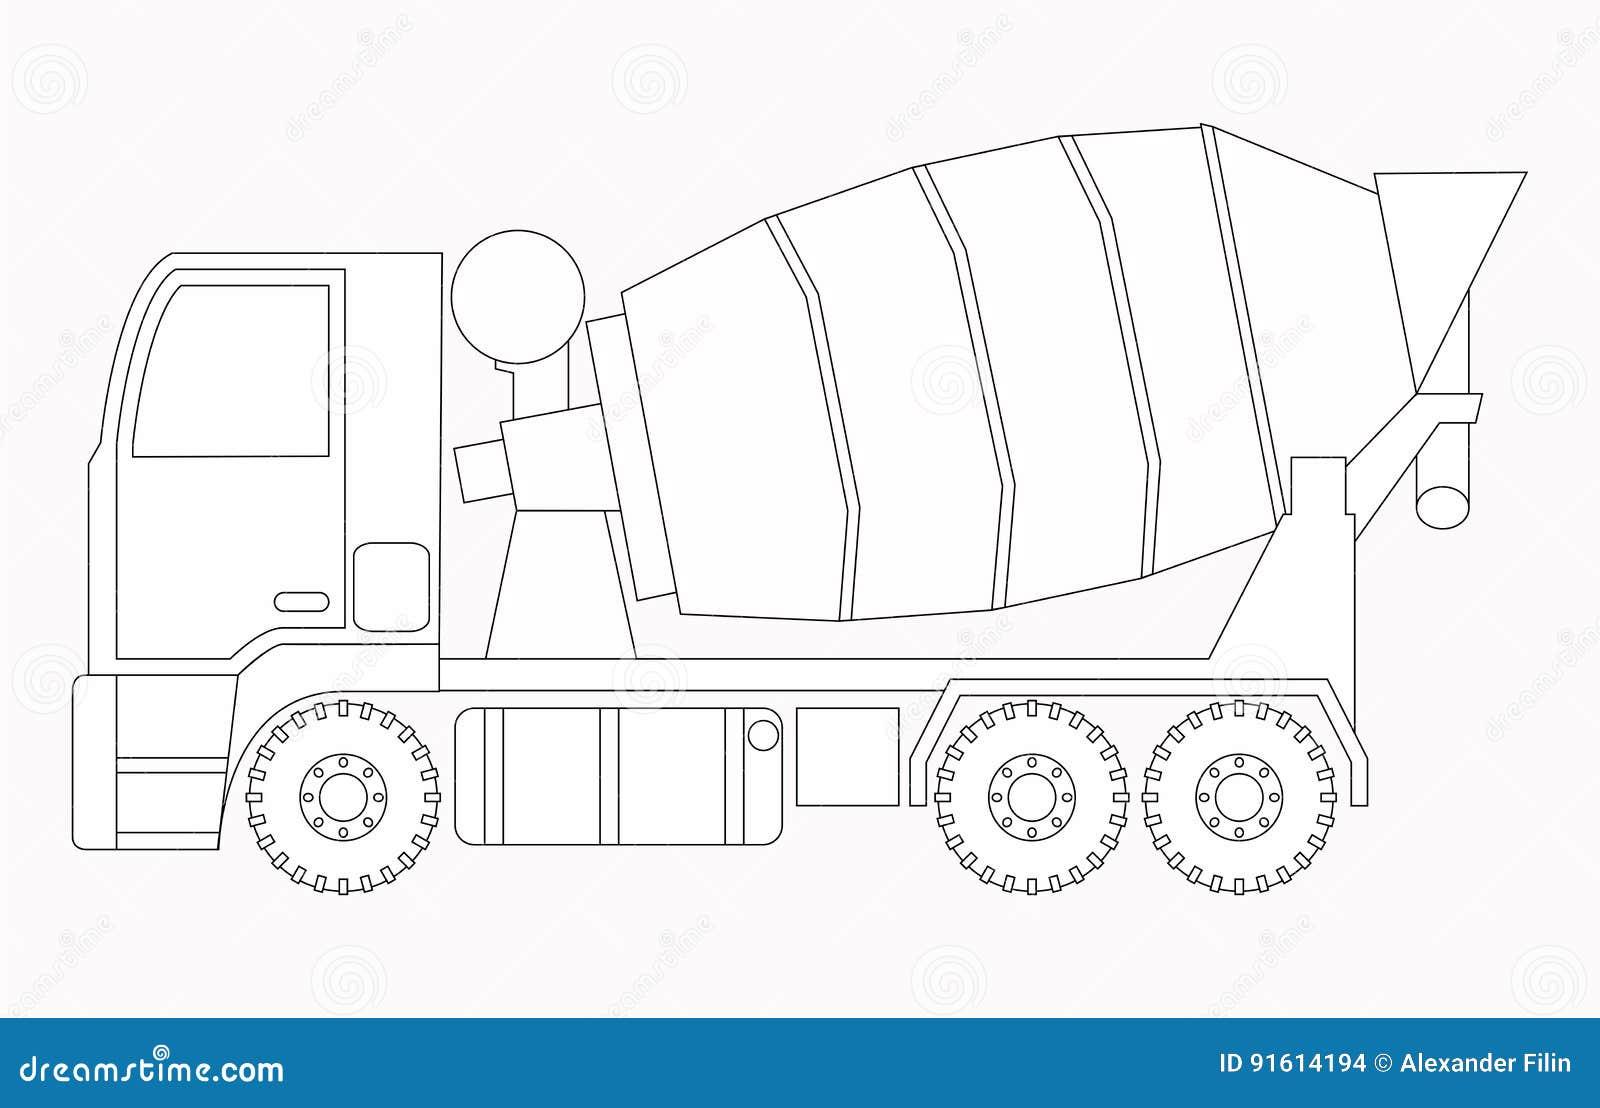 Tough Boys Construction Coloring | Free | Construction Equipment | 917x1300